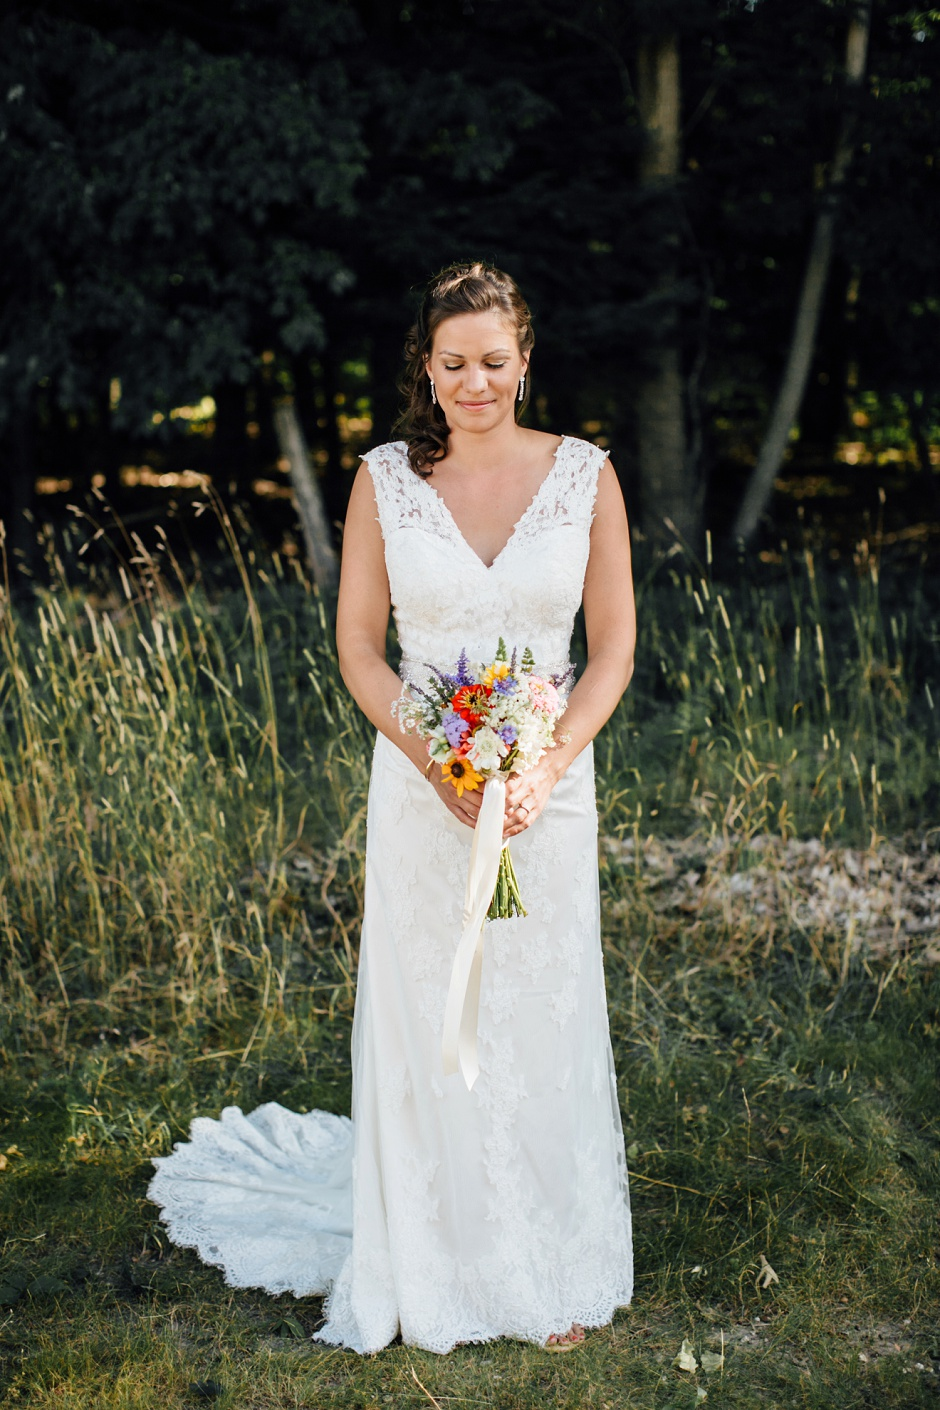 traverse-city_wedding_photographer018